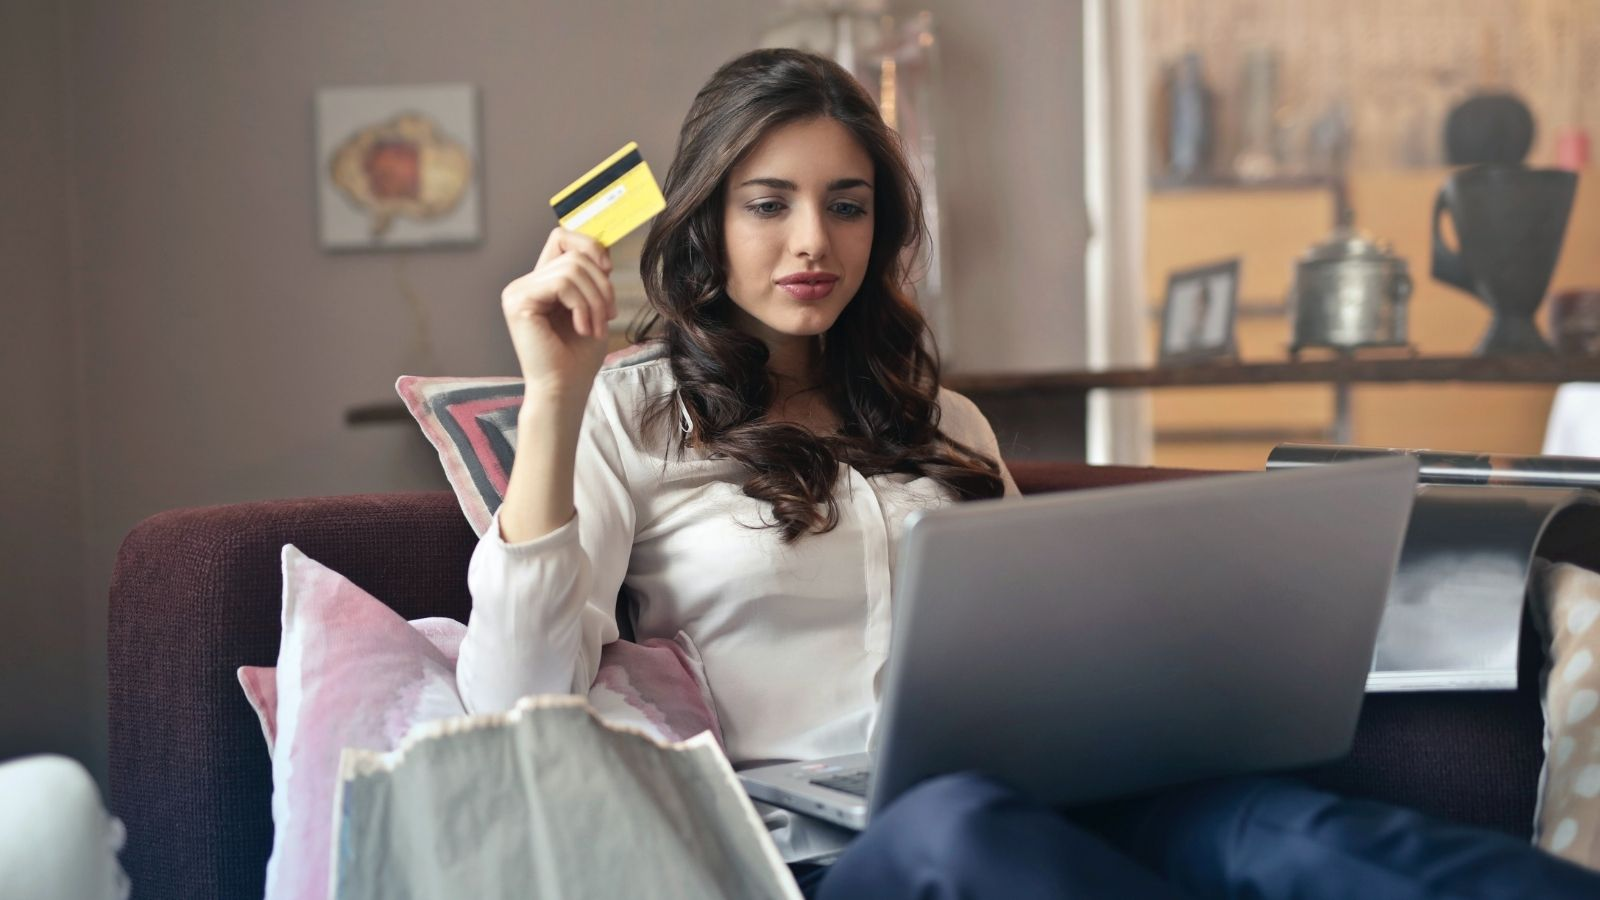 Jak budować Customer Experience? customer experience mediarun com customer